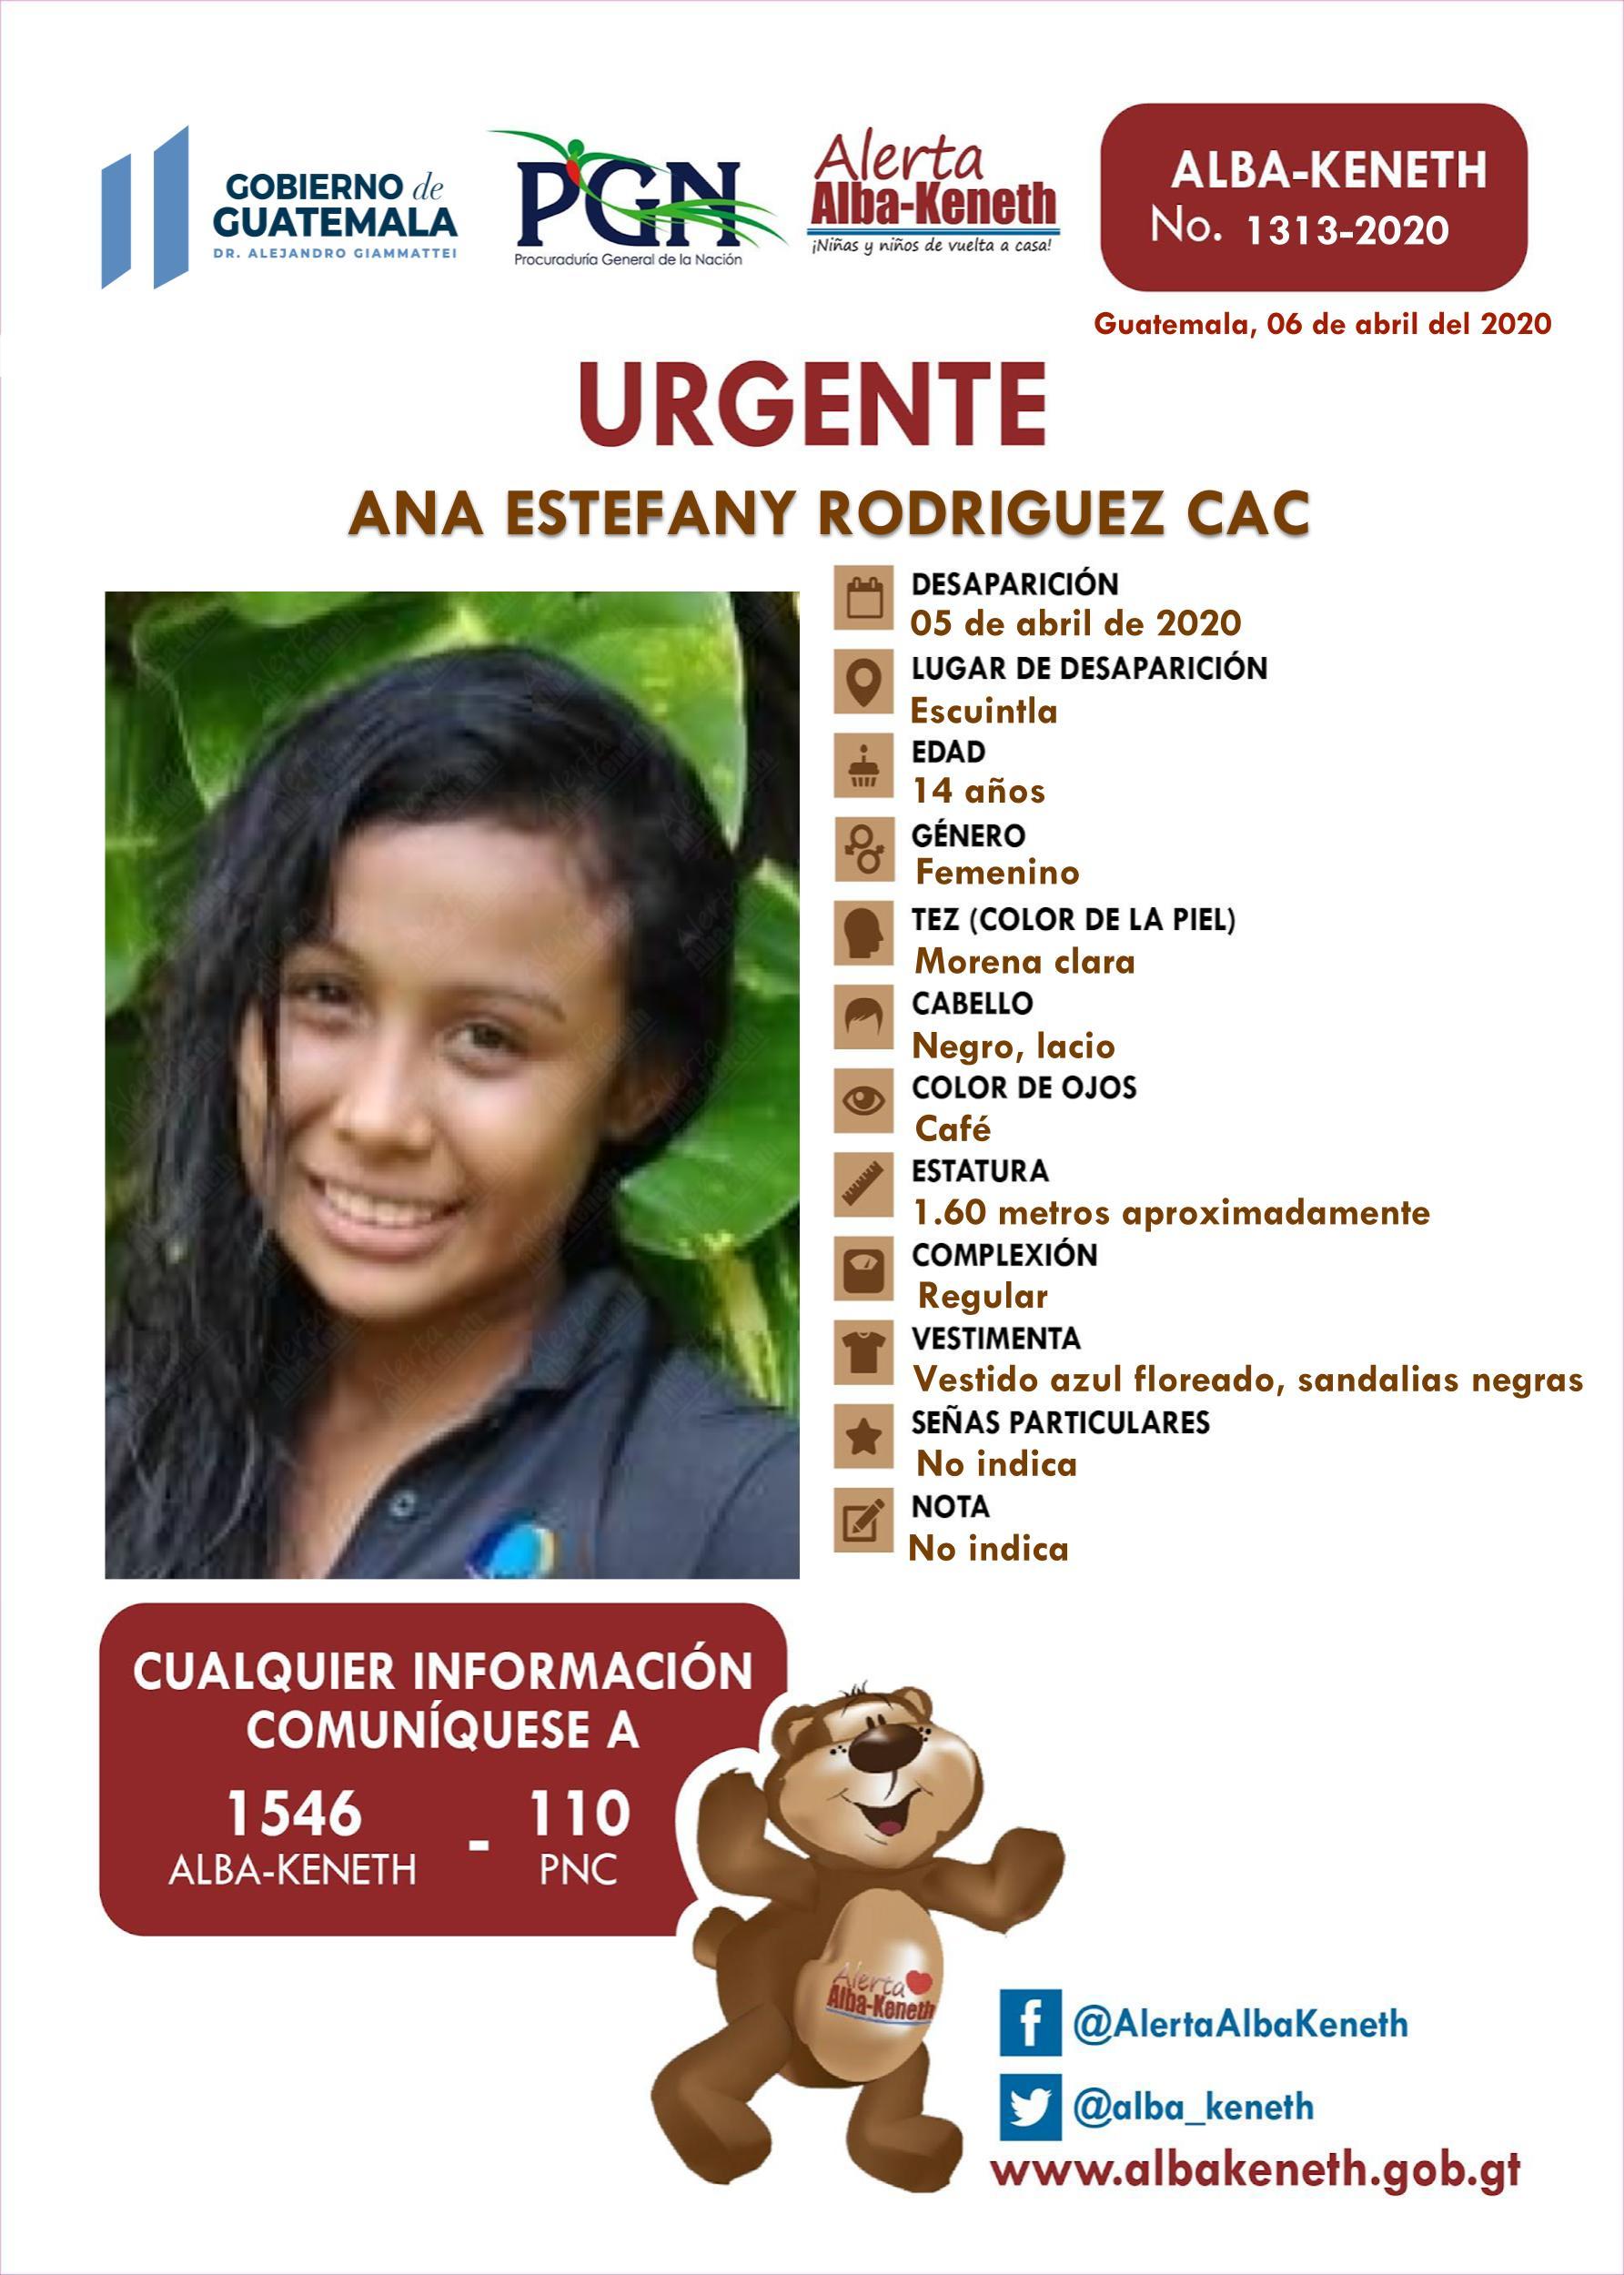 Ana Estefany Rodriguez Cac